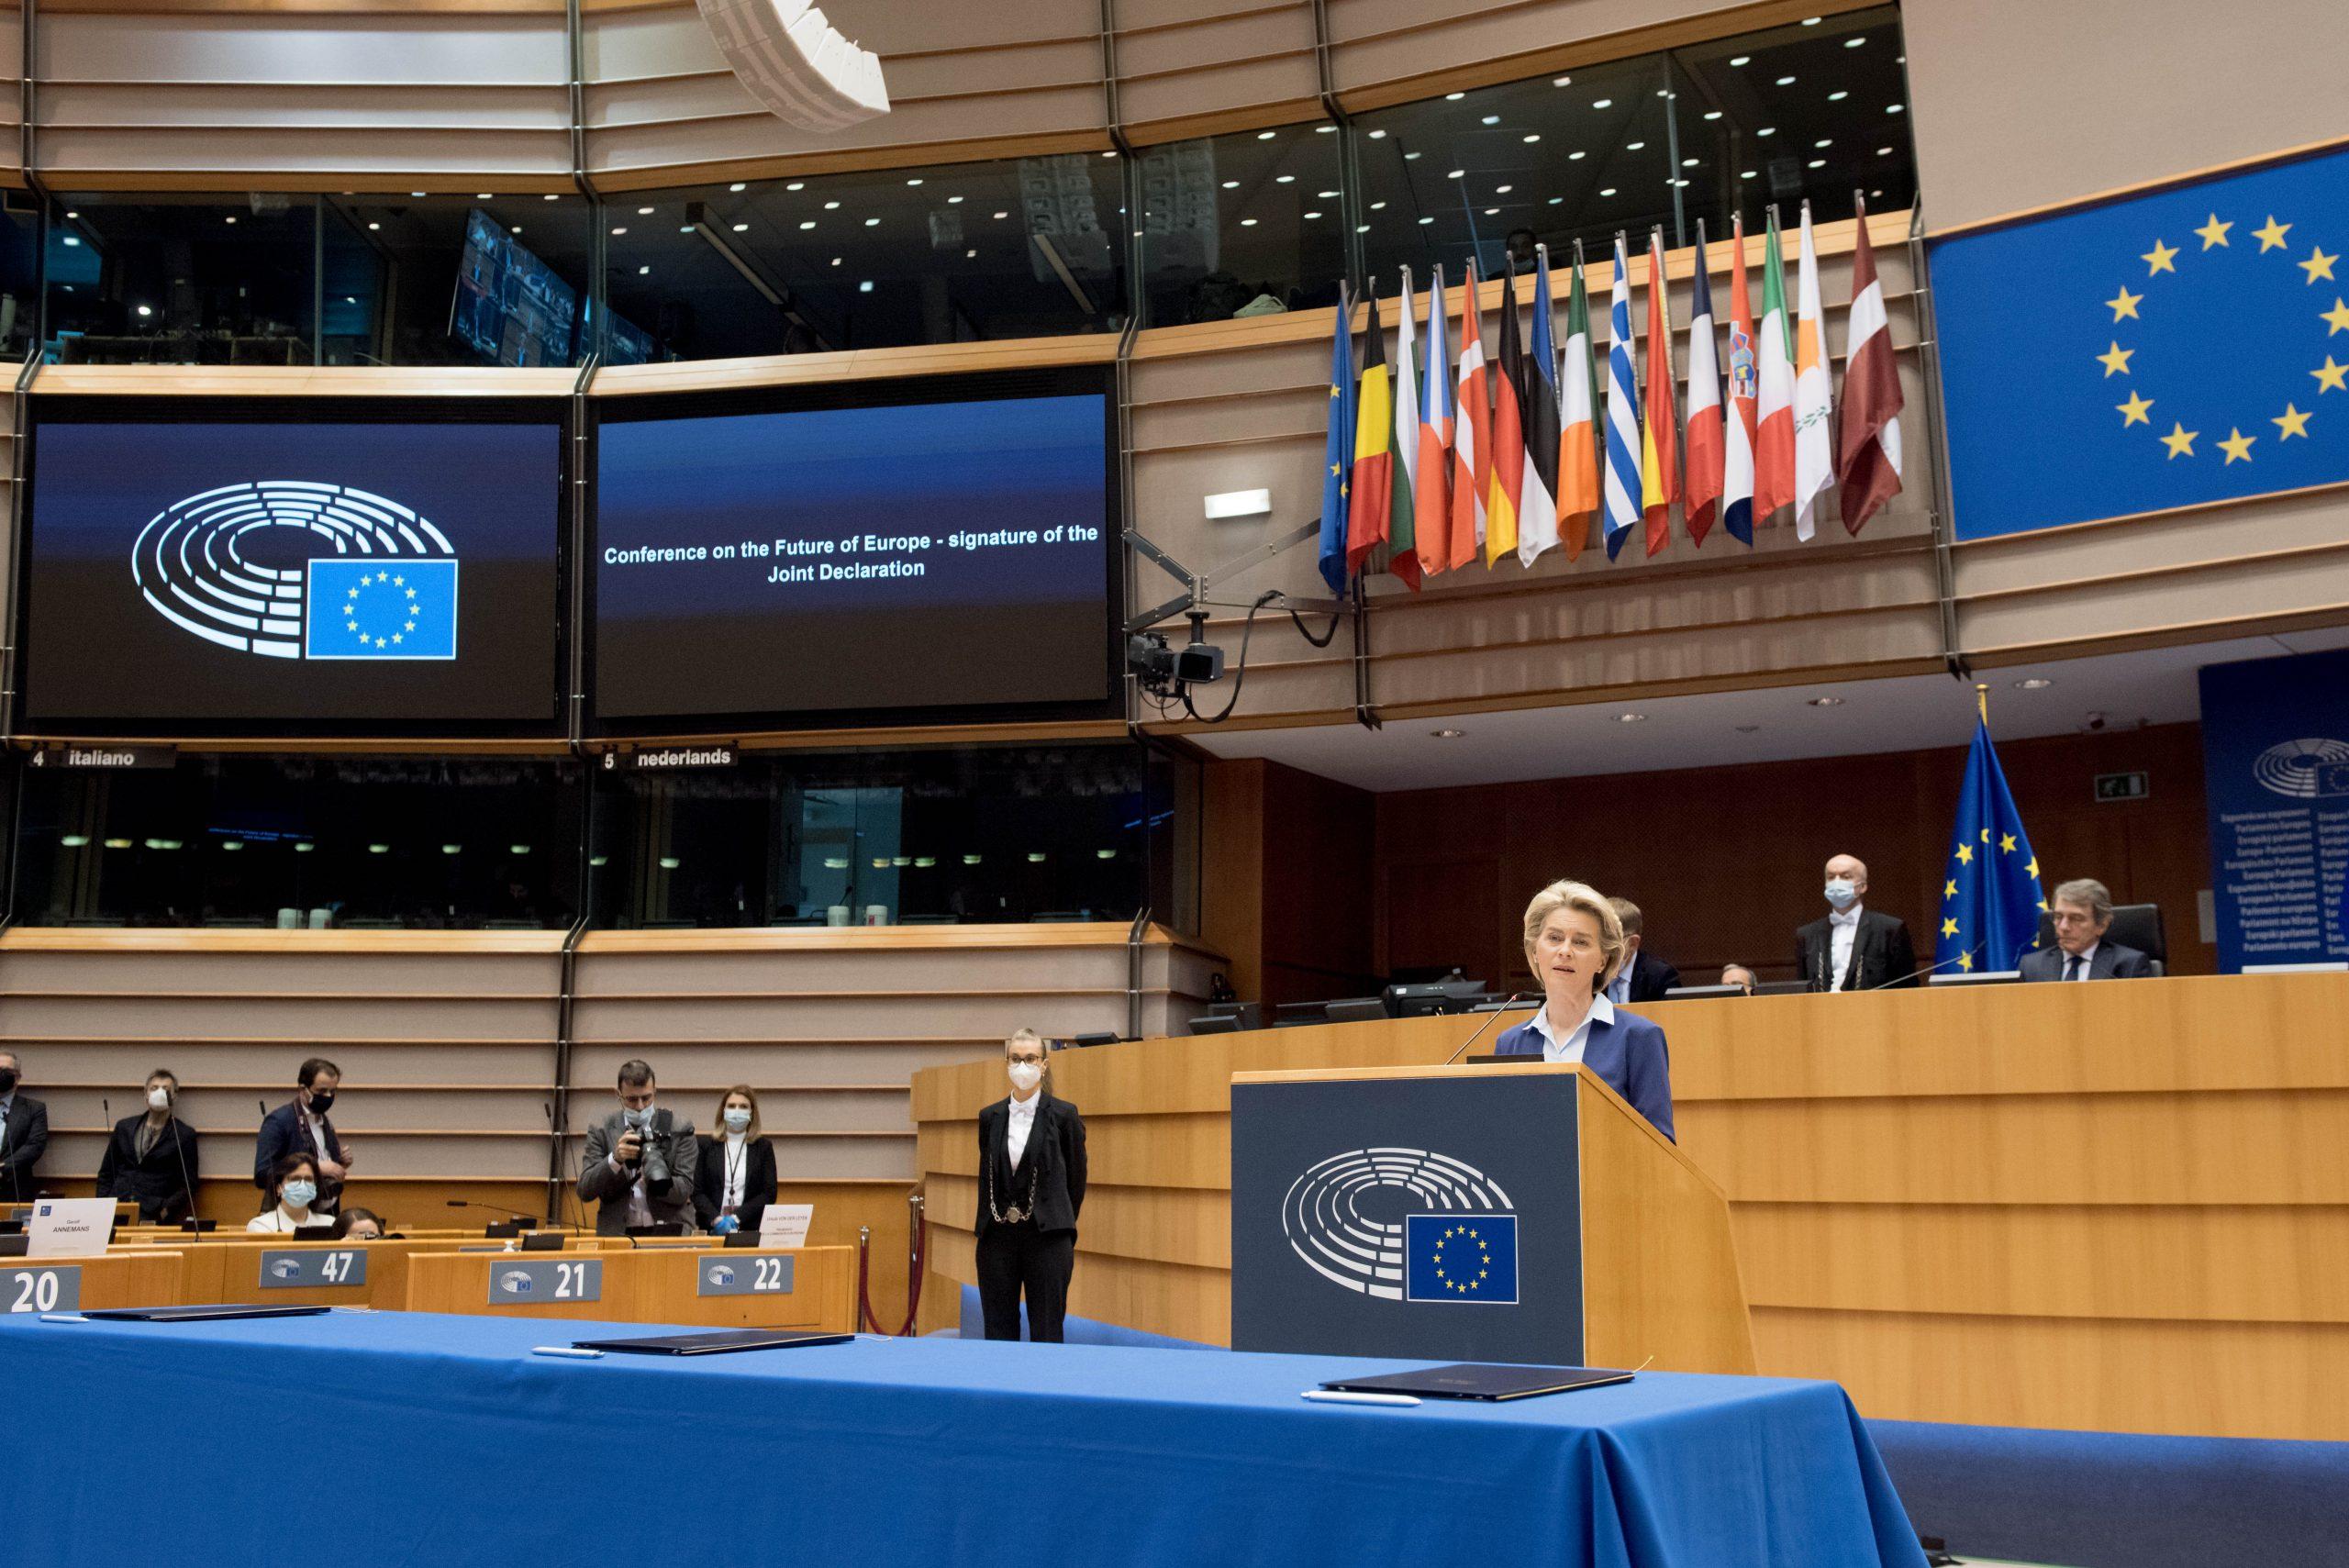 EU-Spitzenkandidaten? Da war doch was… (Gastkommentar, Euractiv)